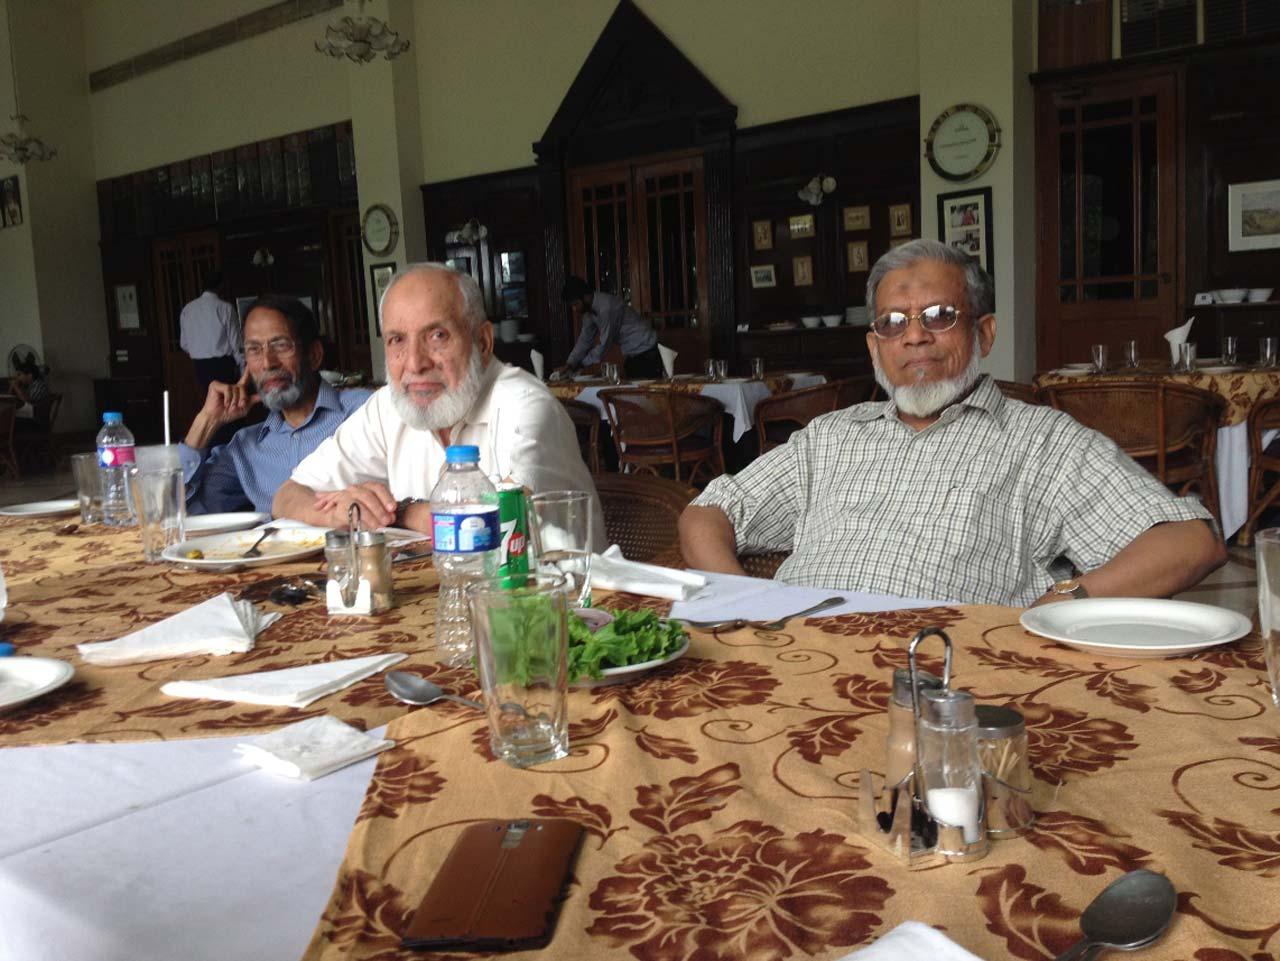 Engr. Tariq Said Bukhari, Engr. Col ® Syed Zafaruddin Ahmad, Engr. Iqbal Ahmed Khan